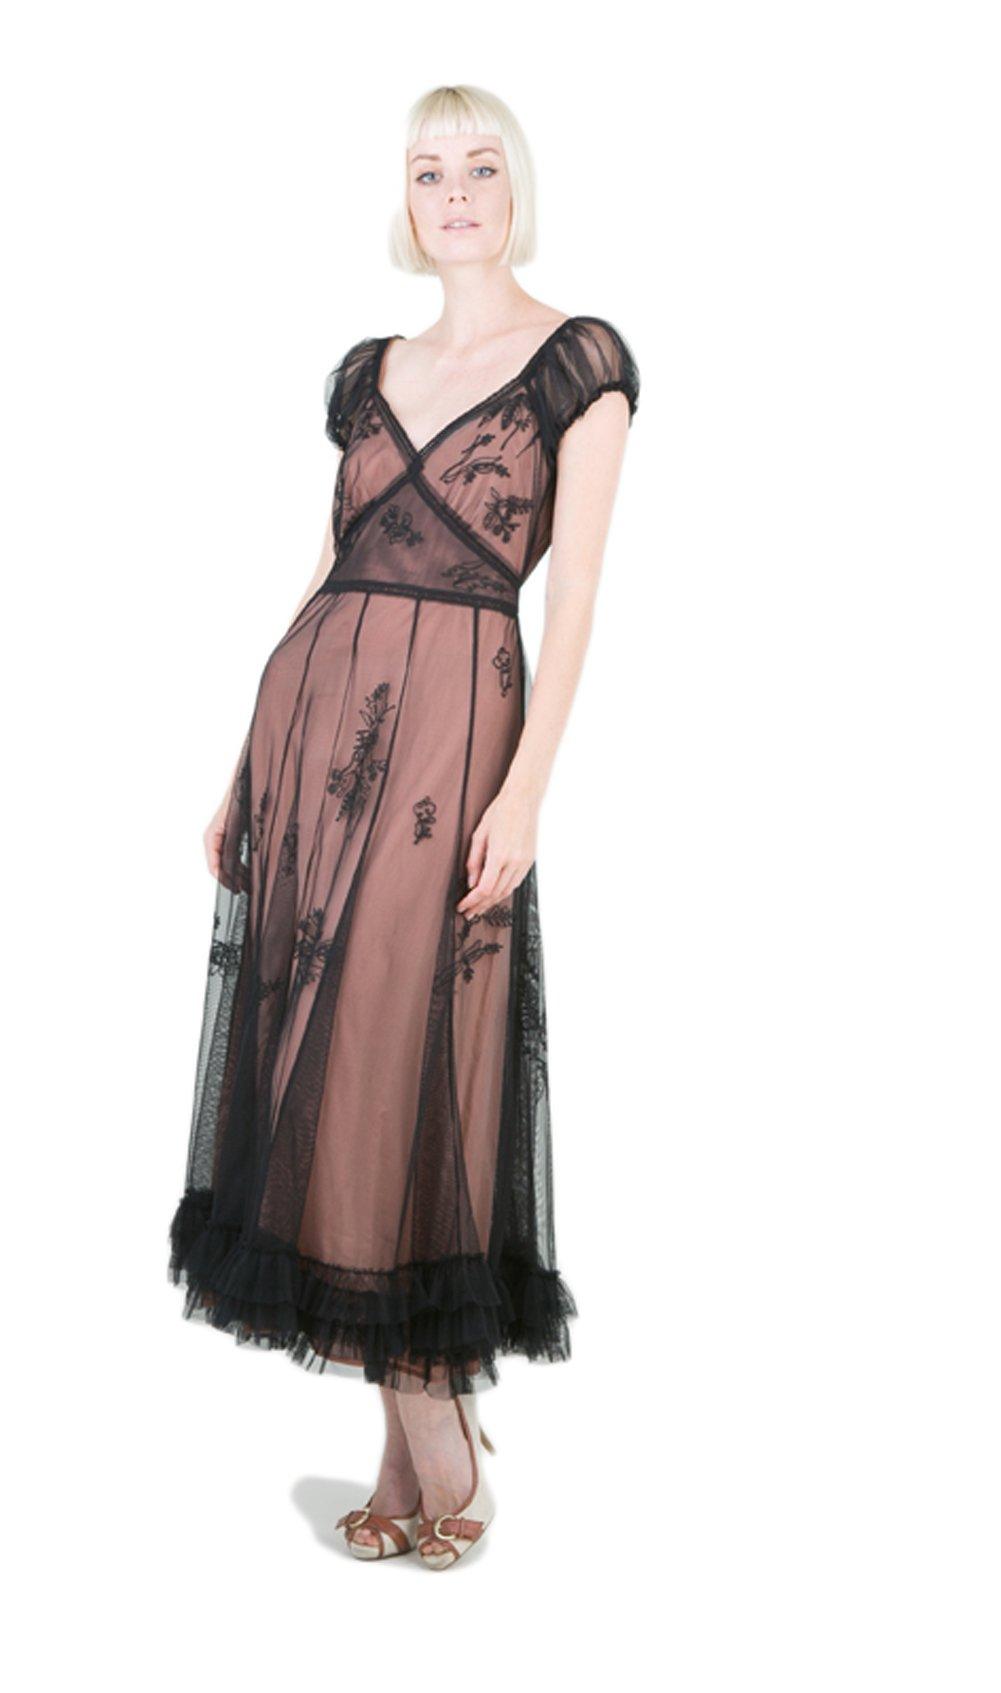 Nataya 40193 Women's Ballerina Style Gown Black/Rose Dress (Small)